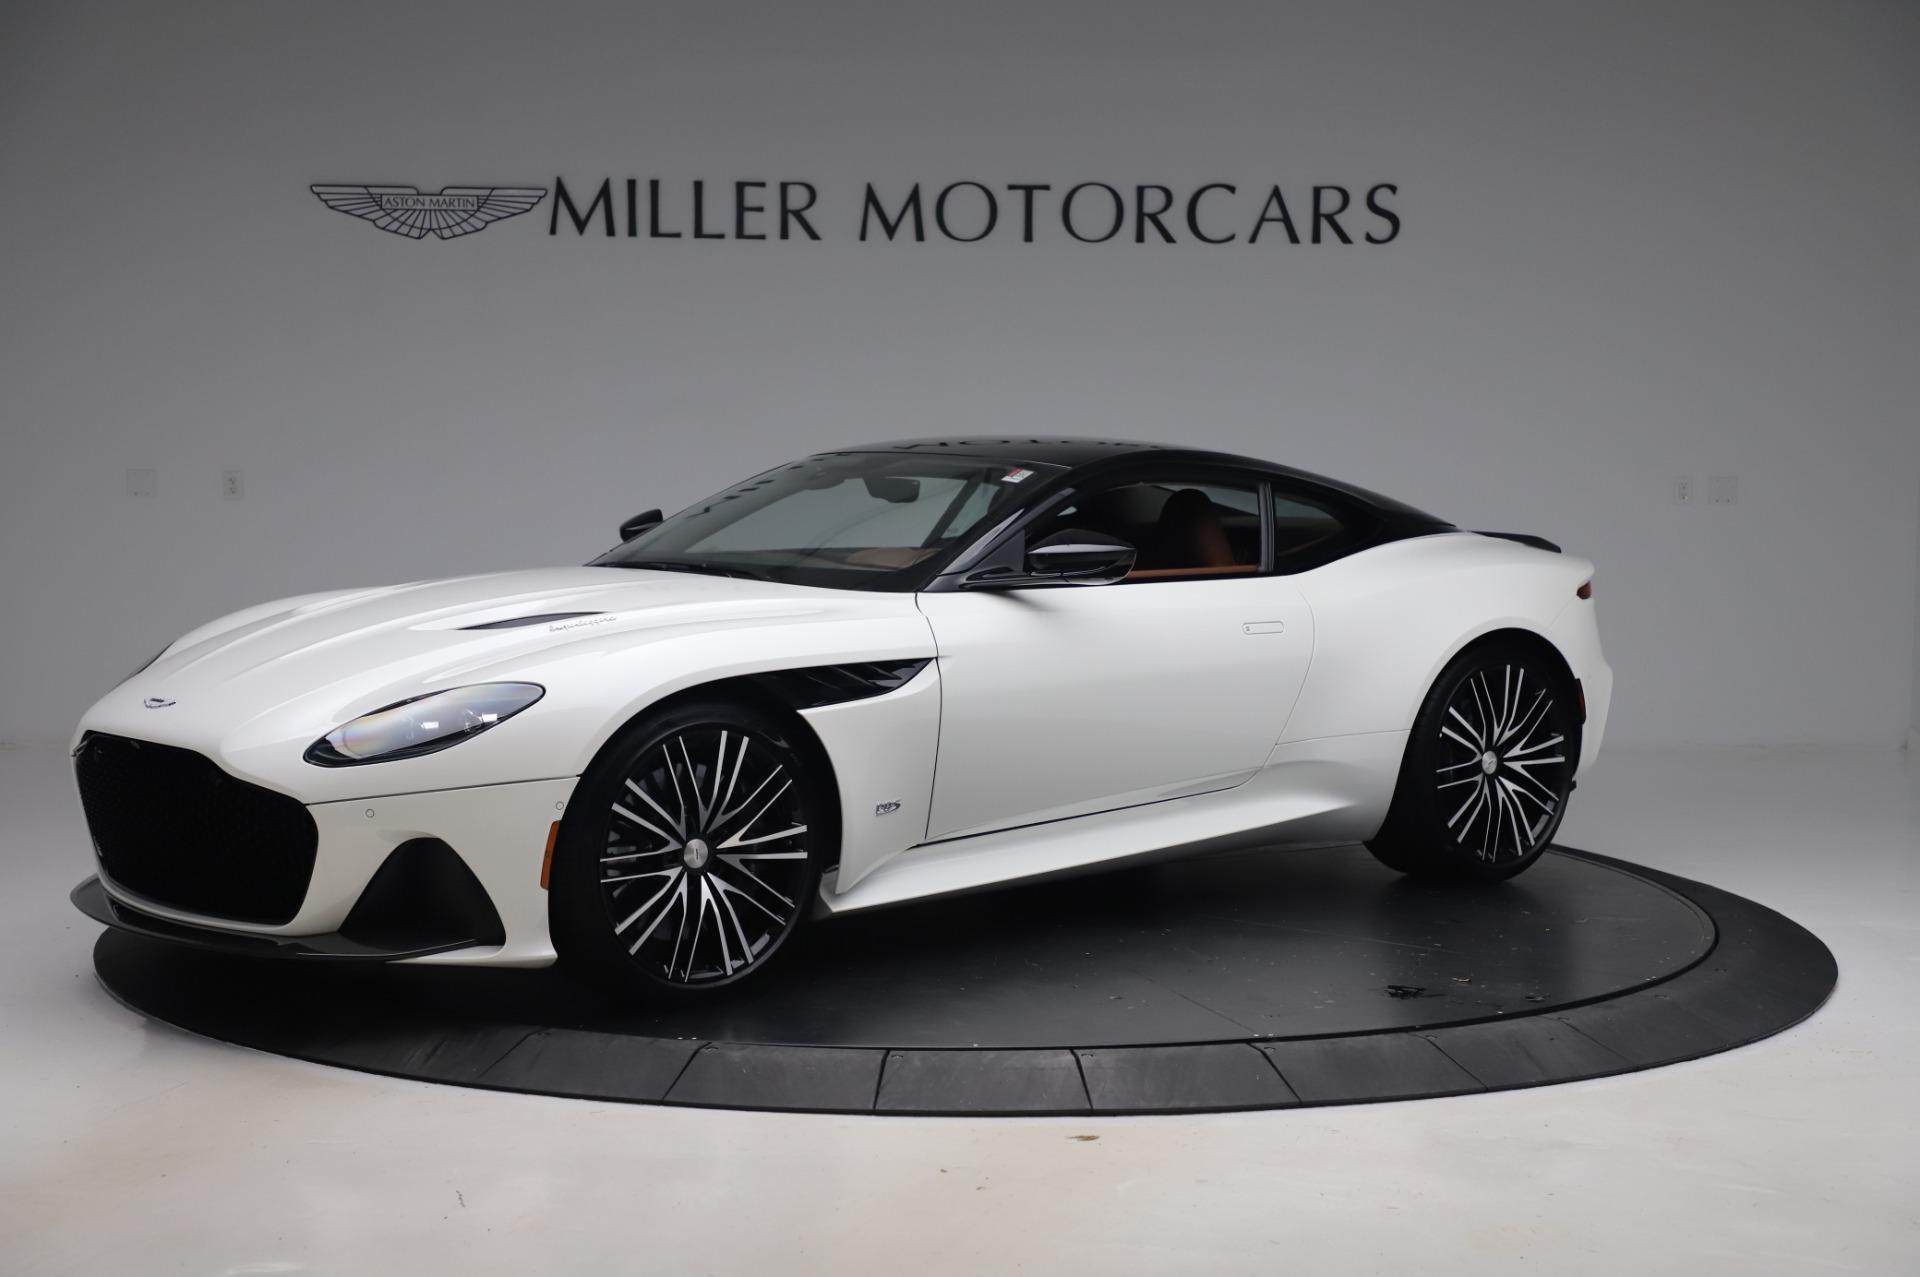 New 2020 Aston Martin DBS Superleggera for sale $337,686 at Pagani of Greenwich in Greenwich CT 06830 1